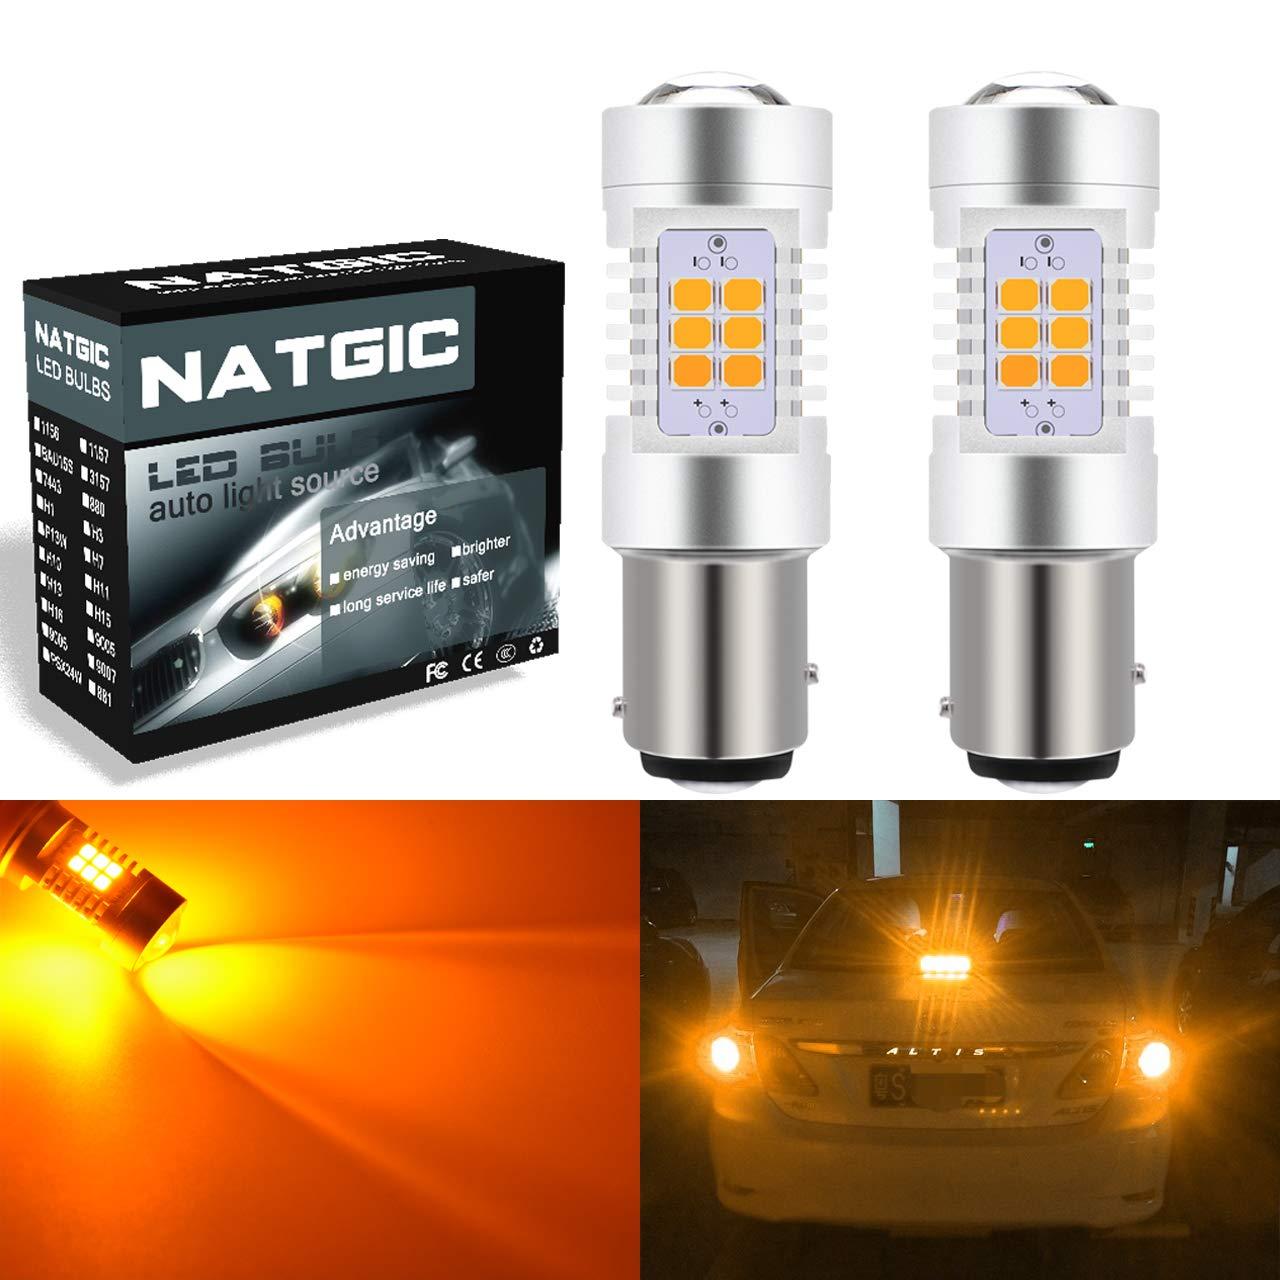 NGCAT Auto LED Bulb 2PCS 7444NA 7440 7440NA 7441 992 T20 2835 21 SMD Chipsets LED Bulbs with Lens Projector Brake Turn Signal Tail Backup Reverse Lights,Xenon White,10-16V 10.5W